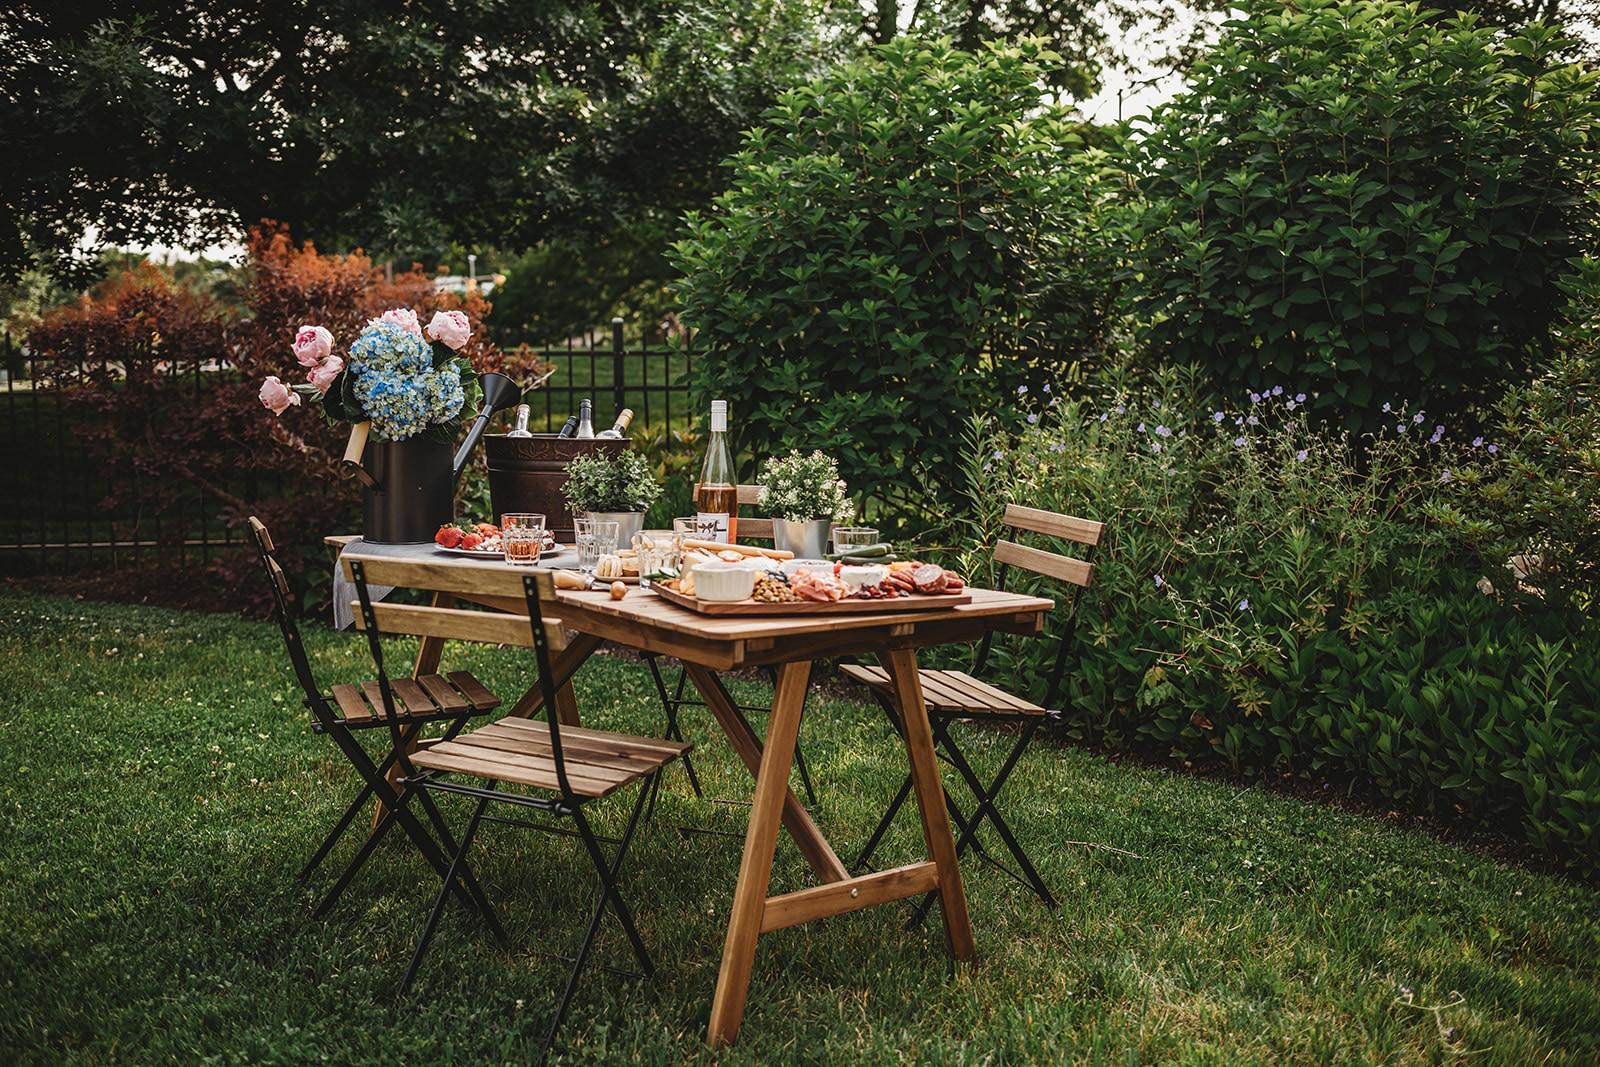 Shot of a tablescape in a garden